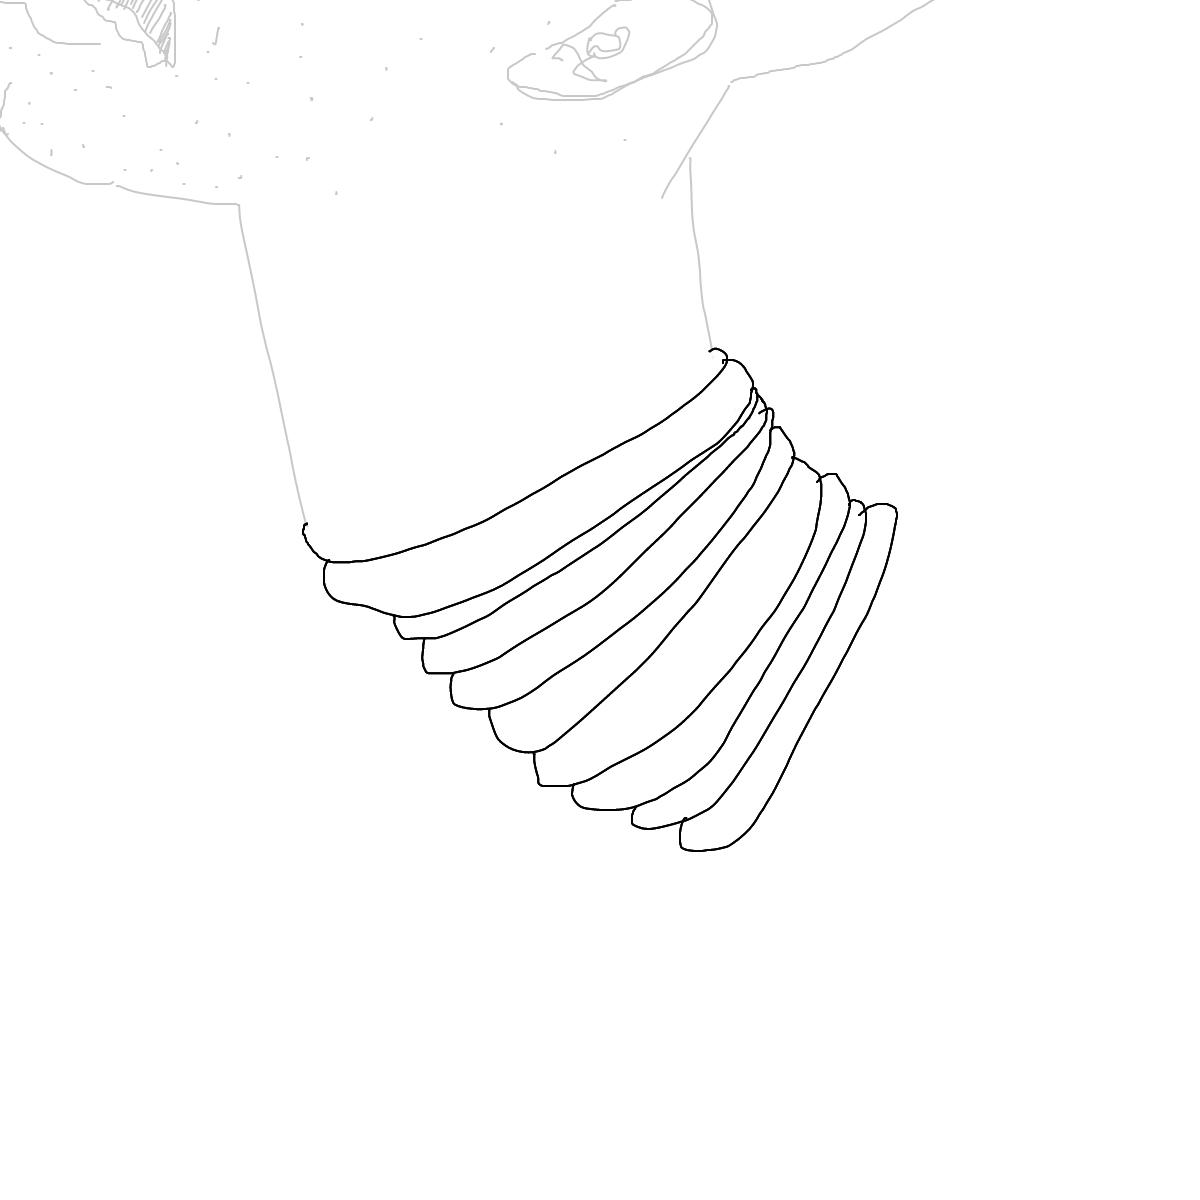 BAAAM drawing#16810 lat:52.4753074645996100lng: 13.4058895111083980